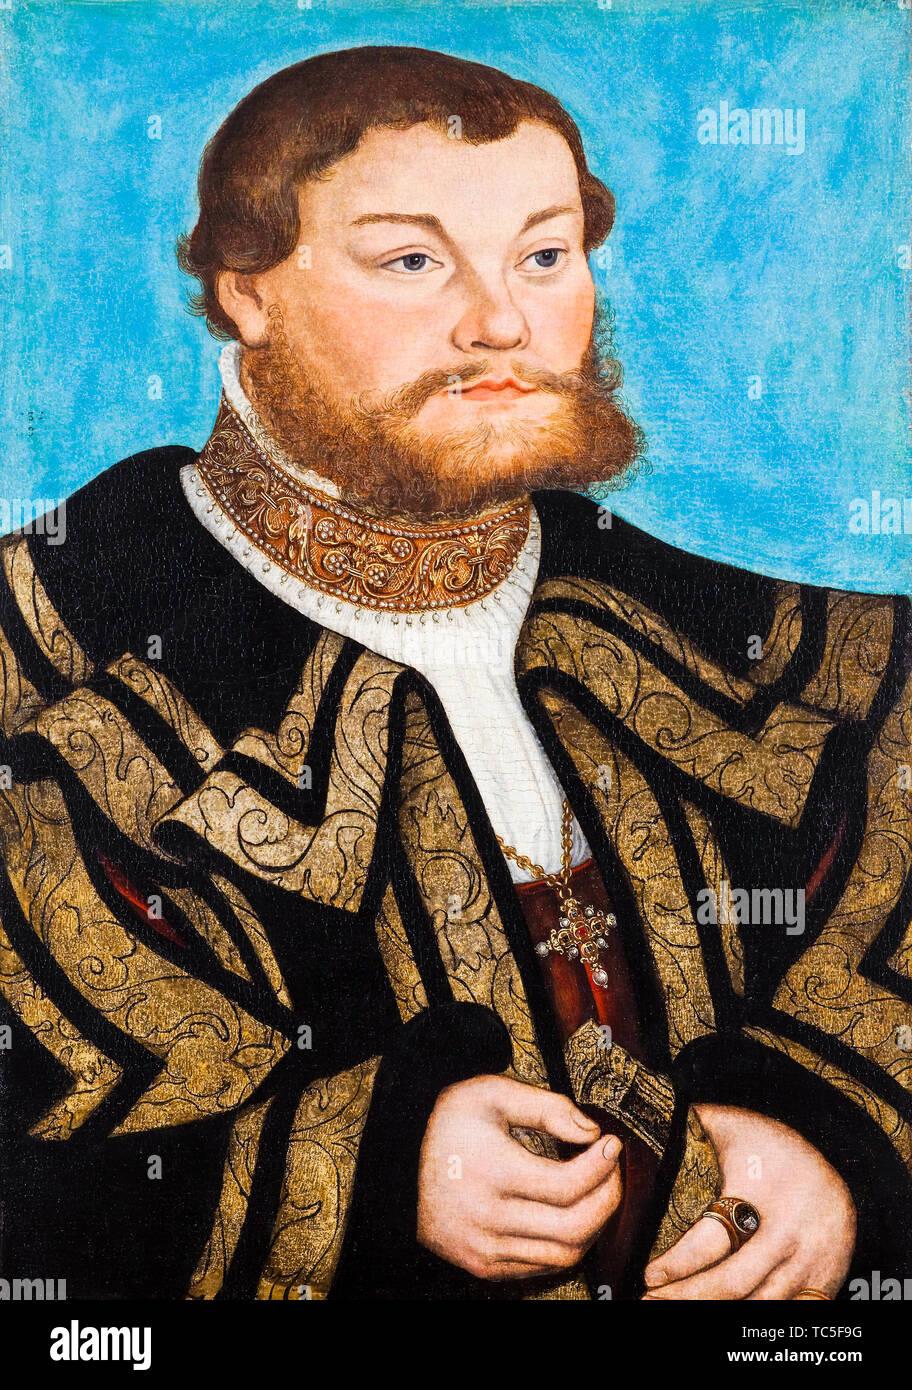 Lucas Cranach the Elder, John V, Prince of Anhalt-Zerbst, 1504-1551, portrait painting, 1532 Stock Photo